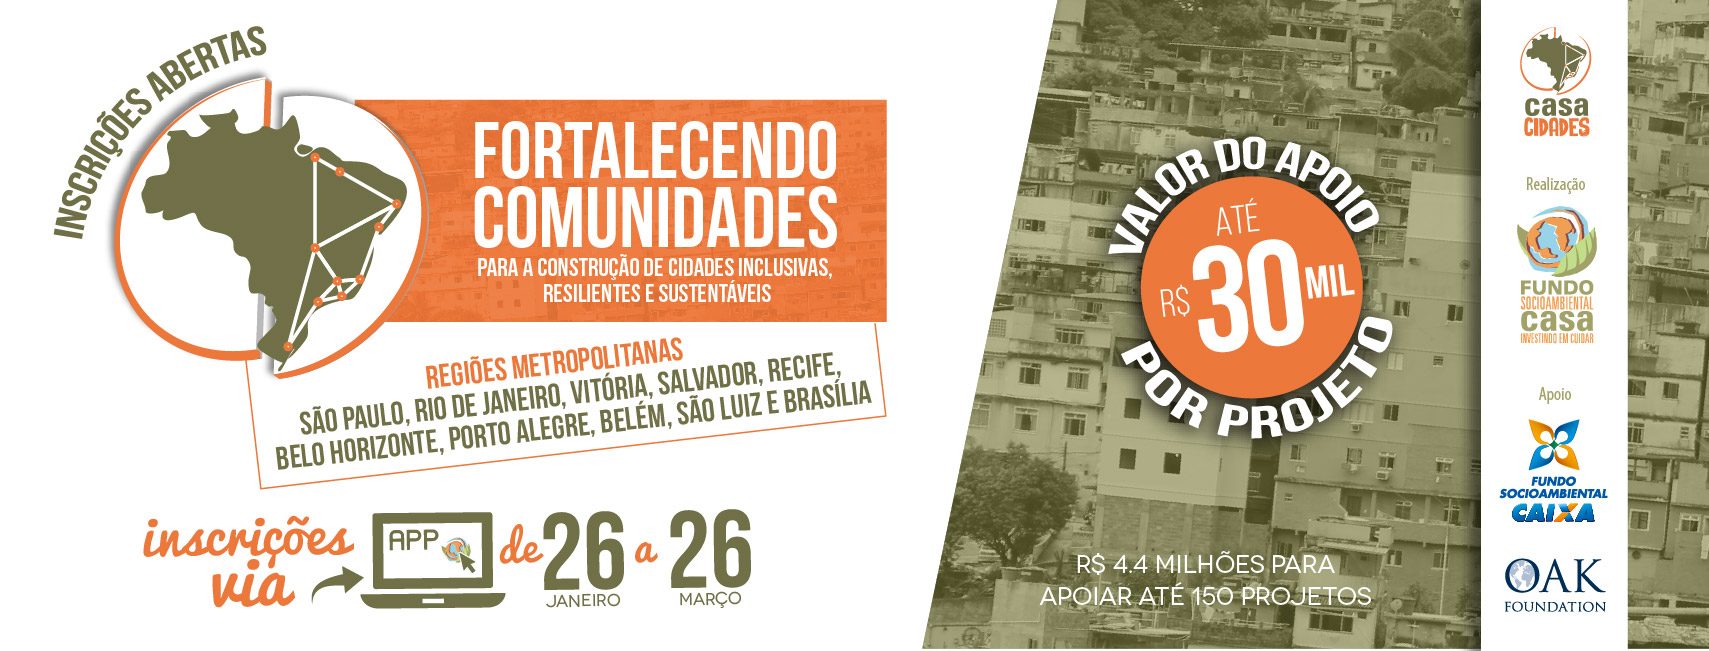 Fortalecendo-Comunidades_POST_03-02